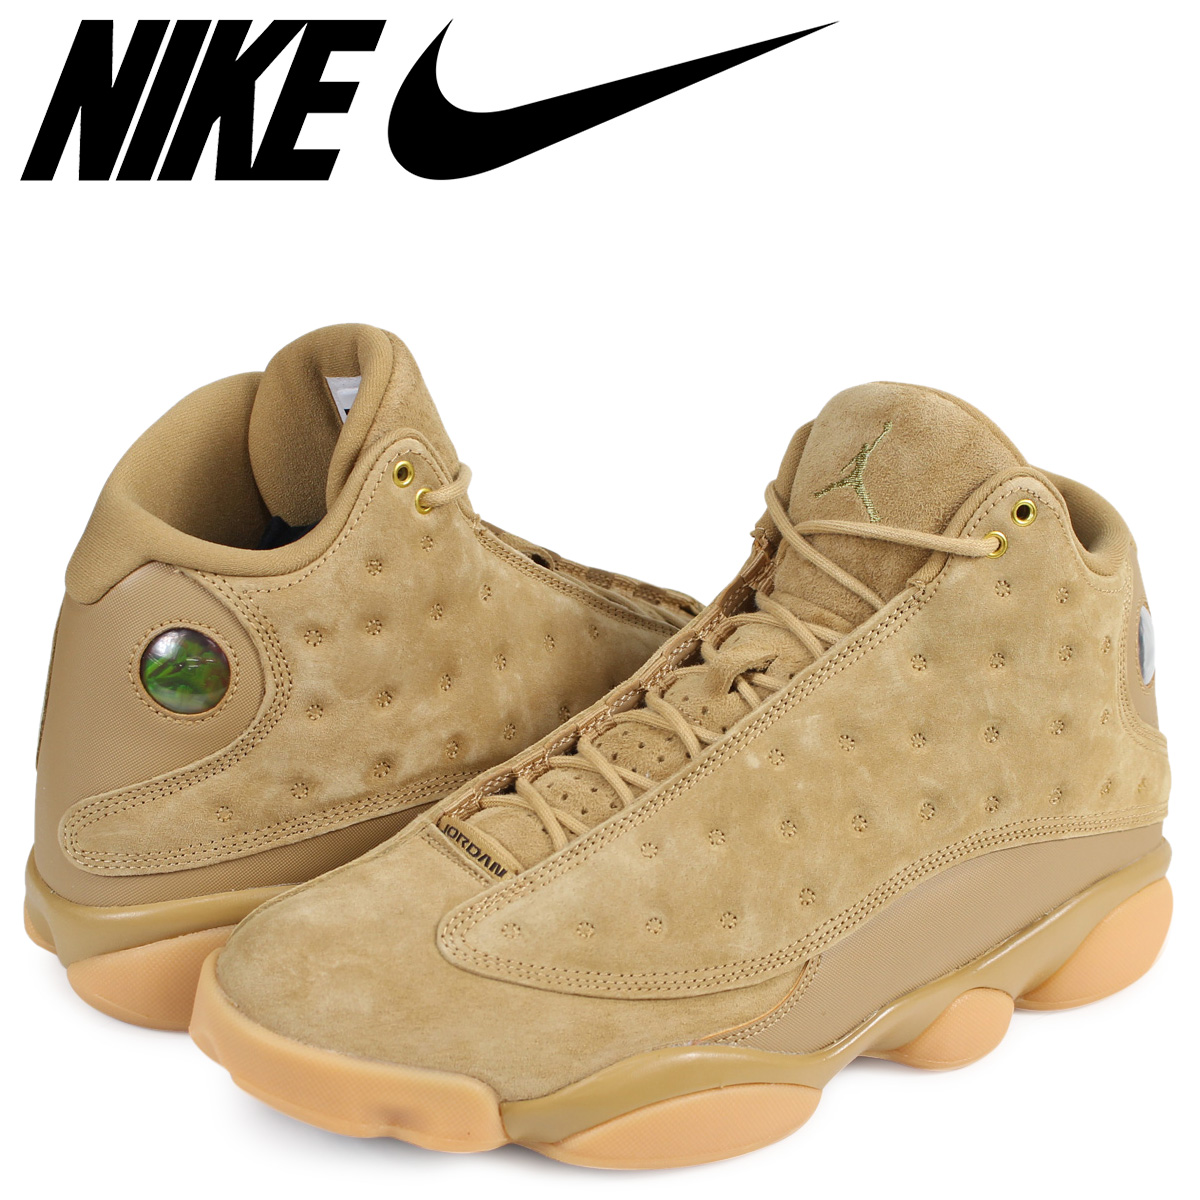 quality design 3528c 279e4 NIKE AIR JORDAN 13 RETRO Nike Air Jordan 13 nostalgic sneakers 414,571-705  men's beige